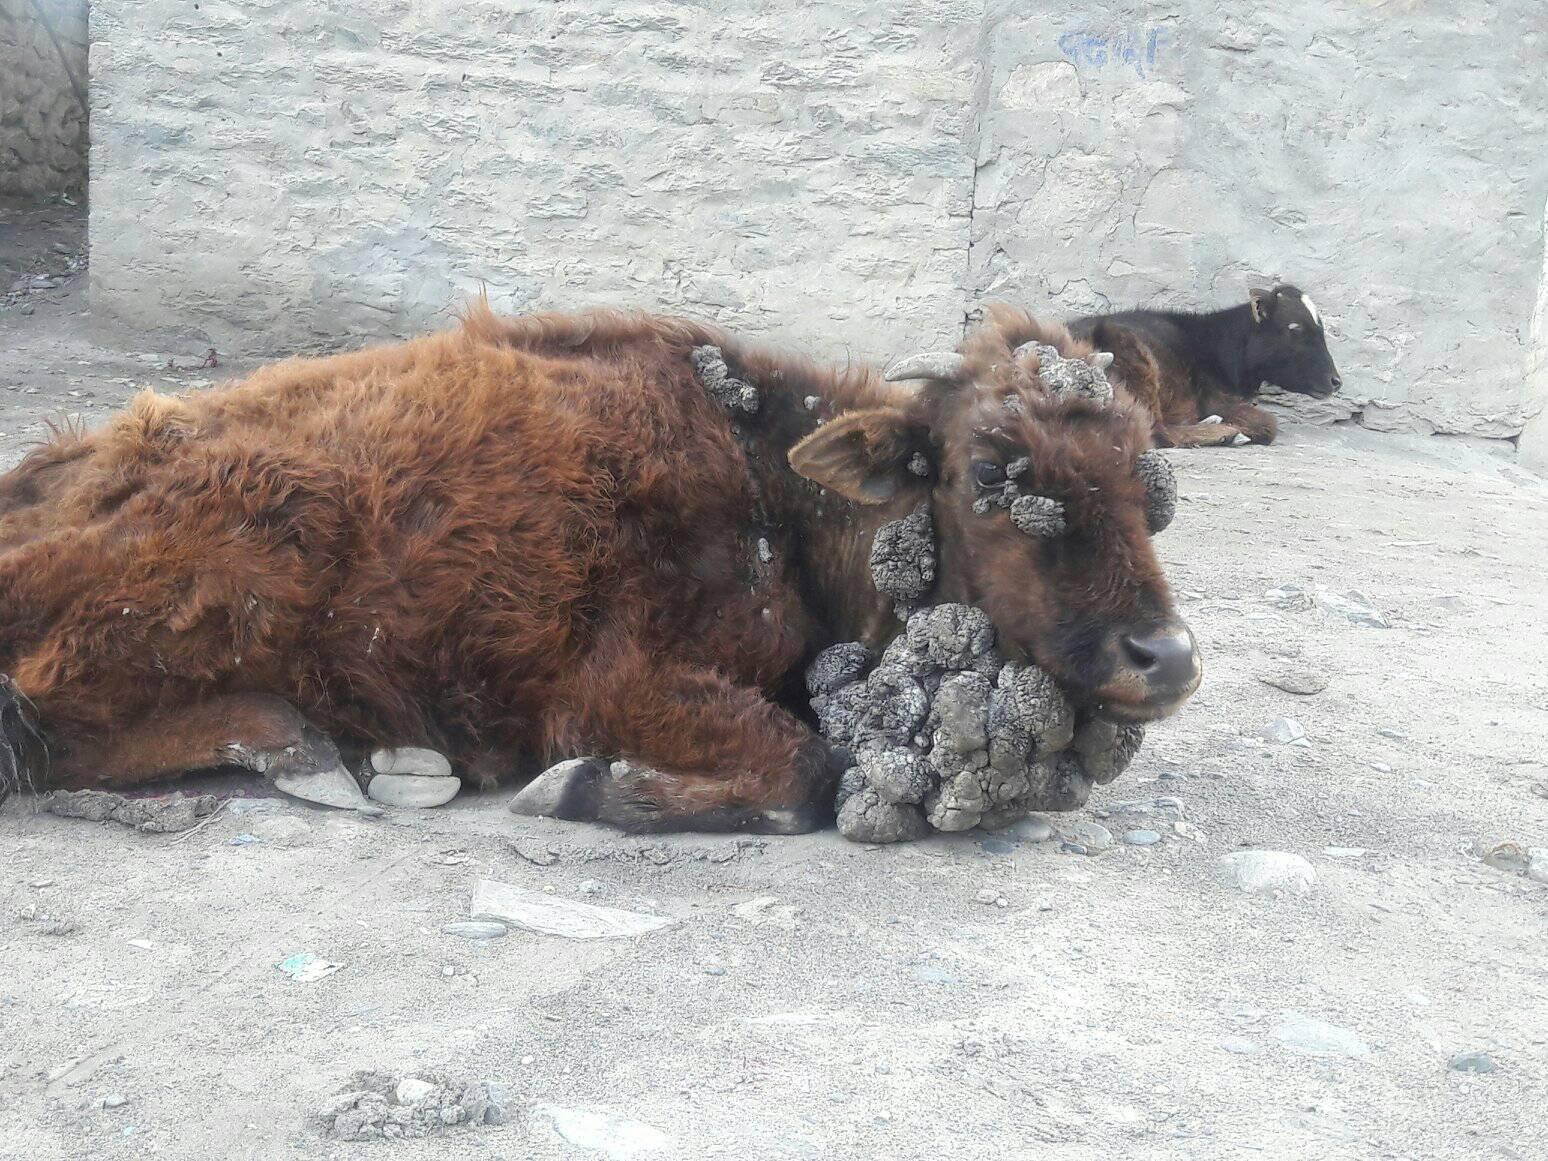 Cow in Jomsom